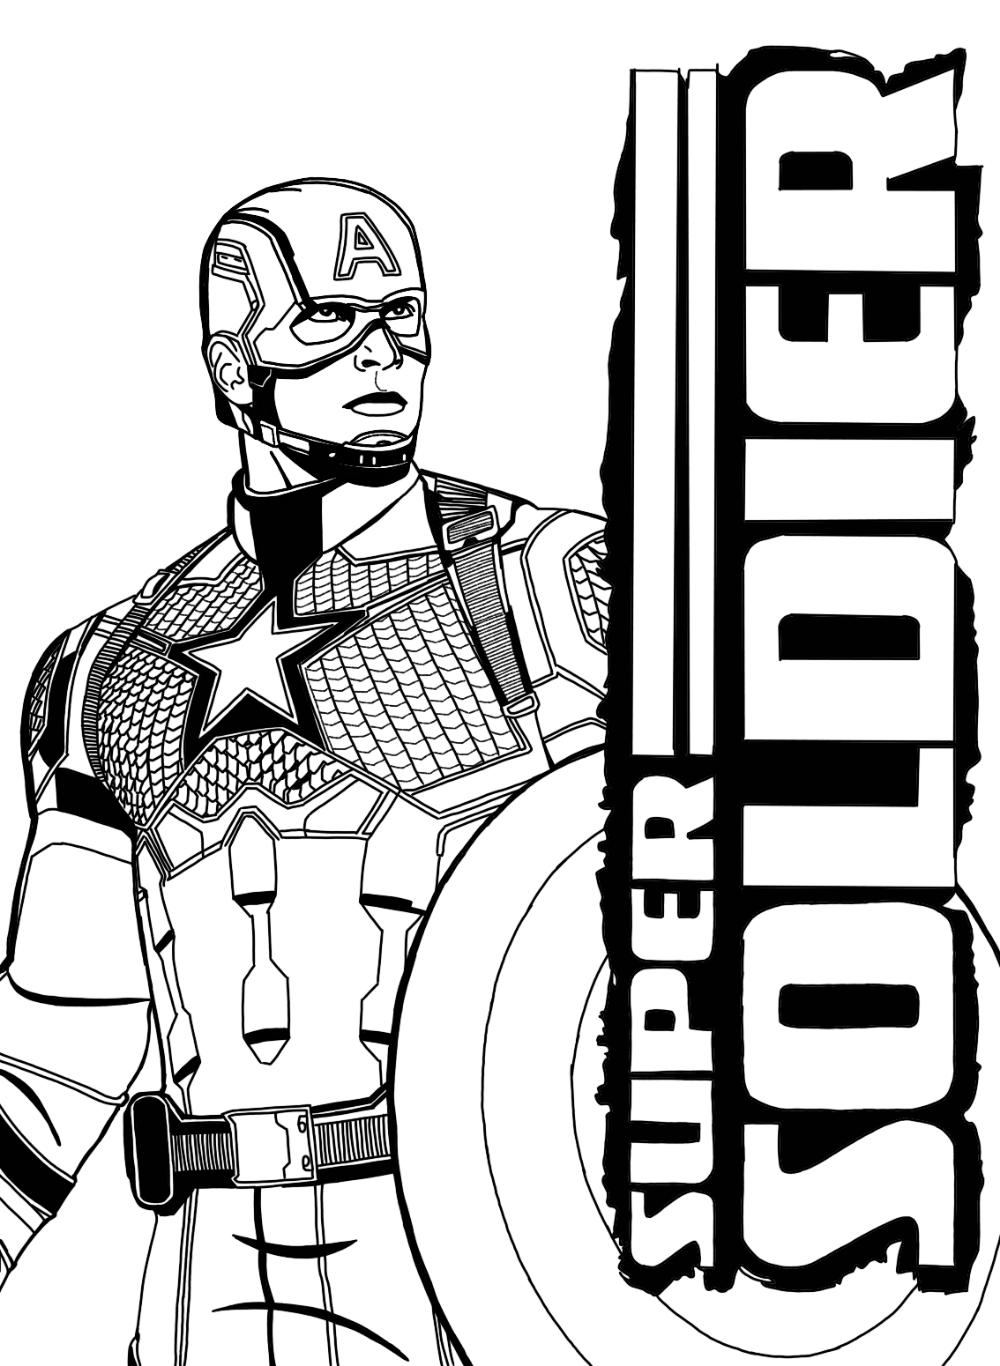 Captain America Endgame Superhero Coloring Pages Captain America Coloring Pages Superhero Coloring Pages Superhero Coloring